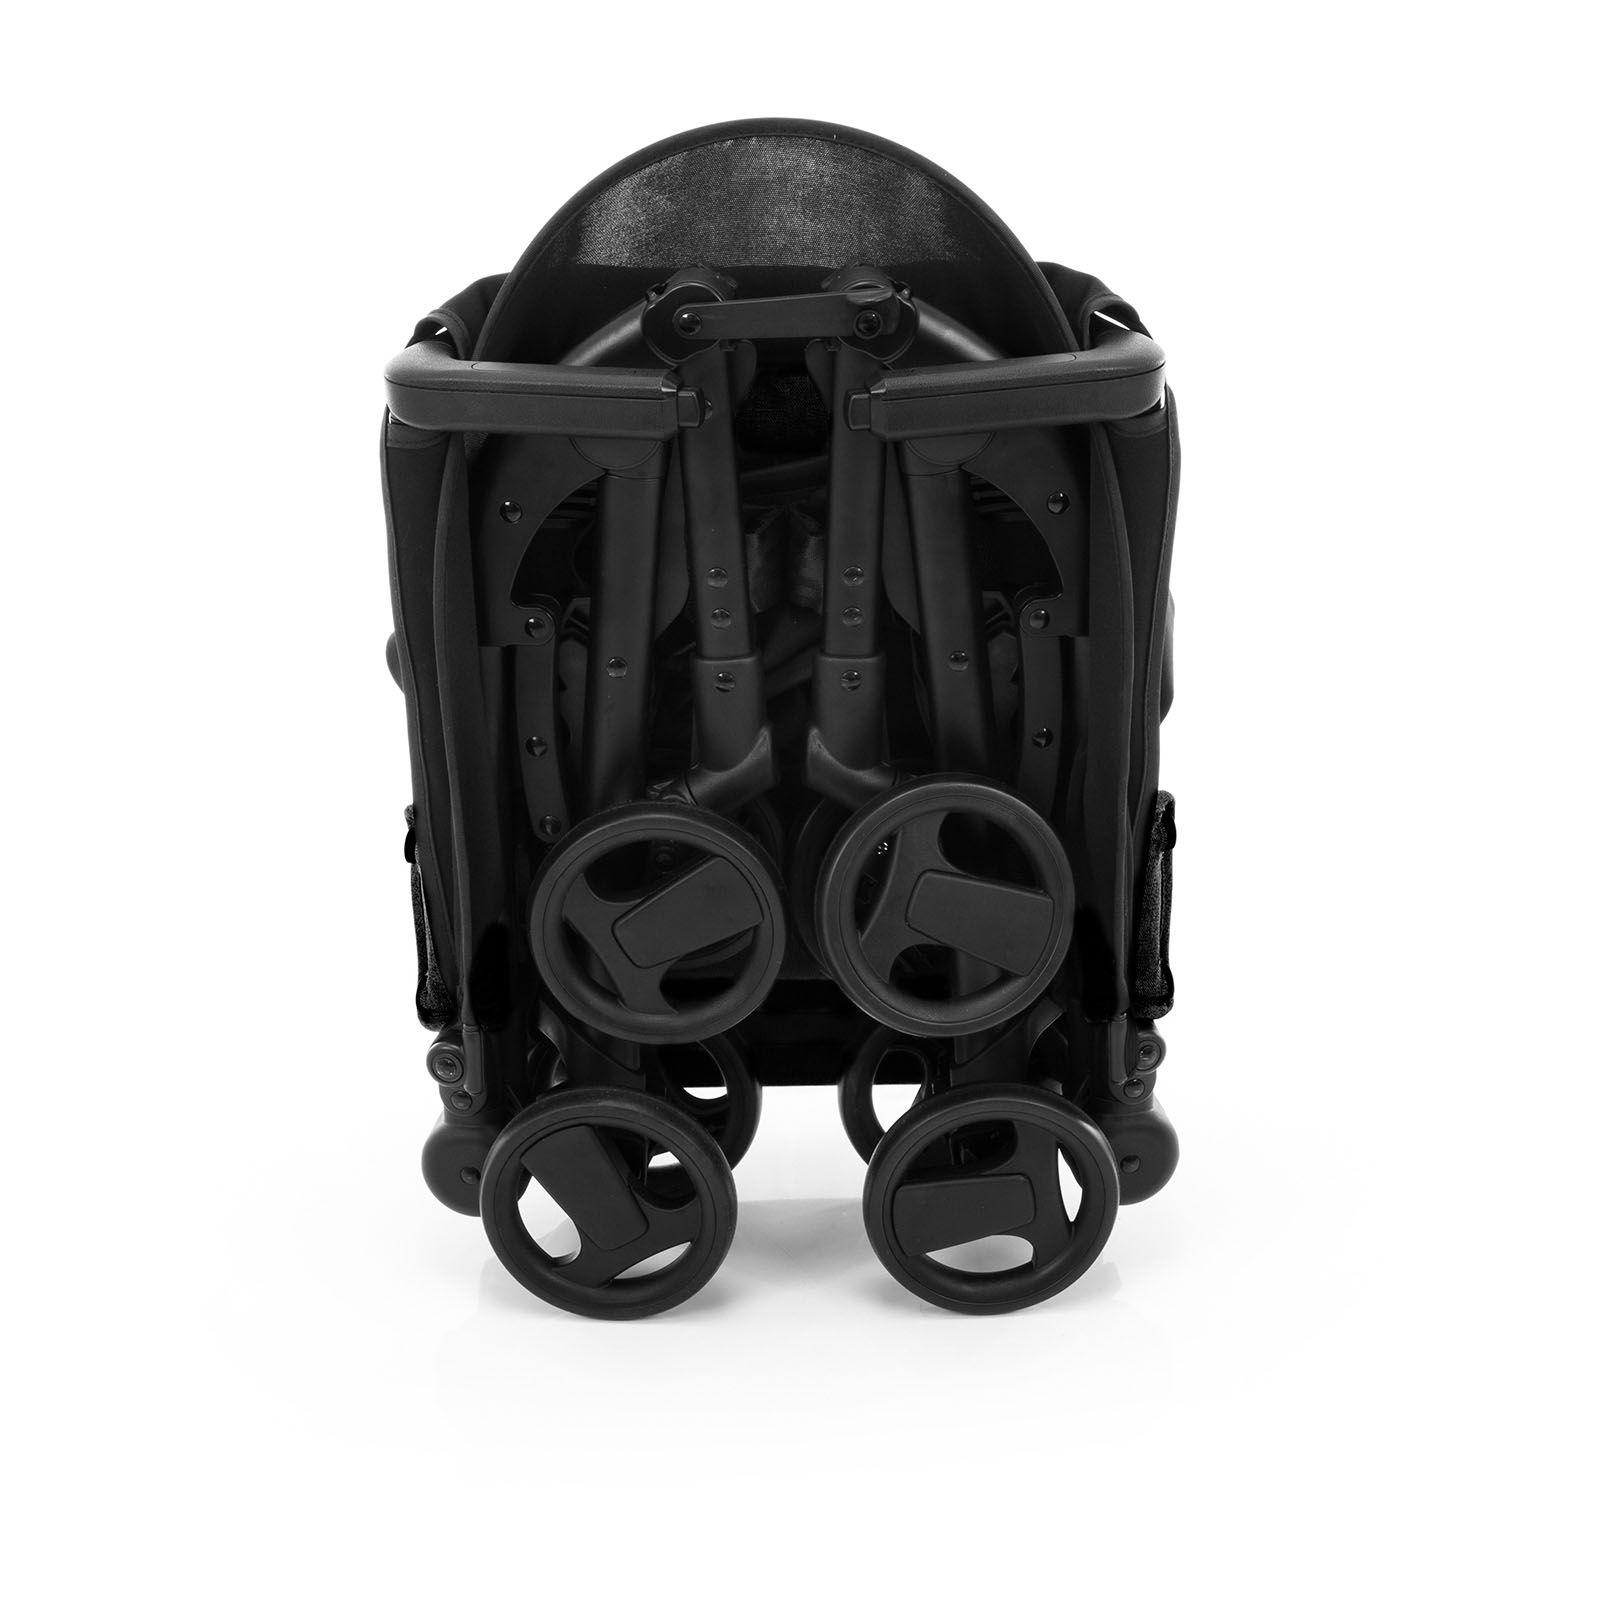 CARRINHO POCKET MICRO - BLACK DENIM - SAFETY 1ST